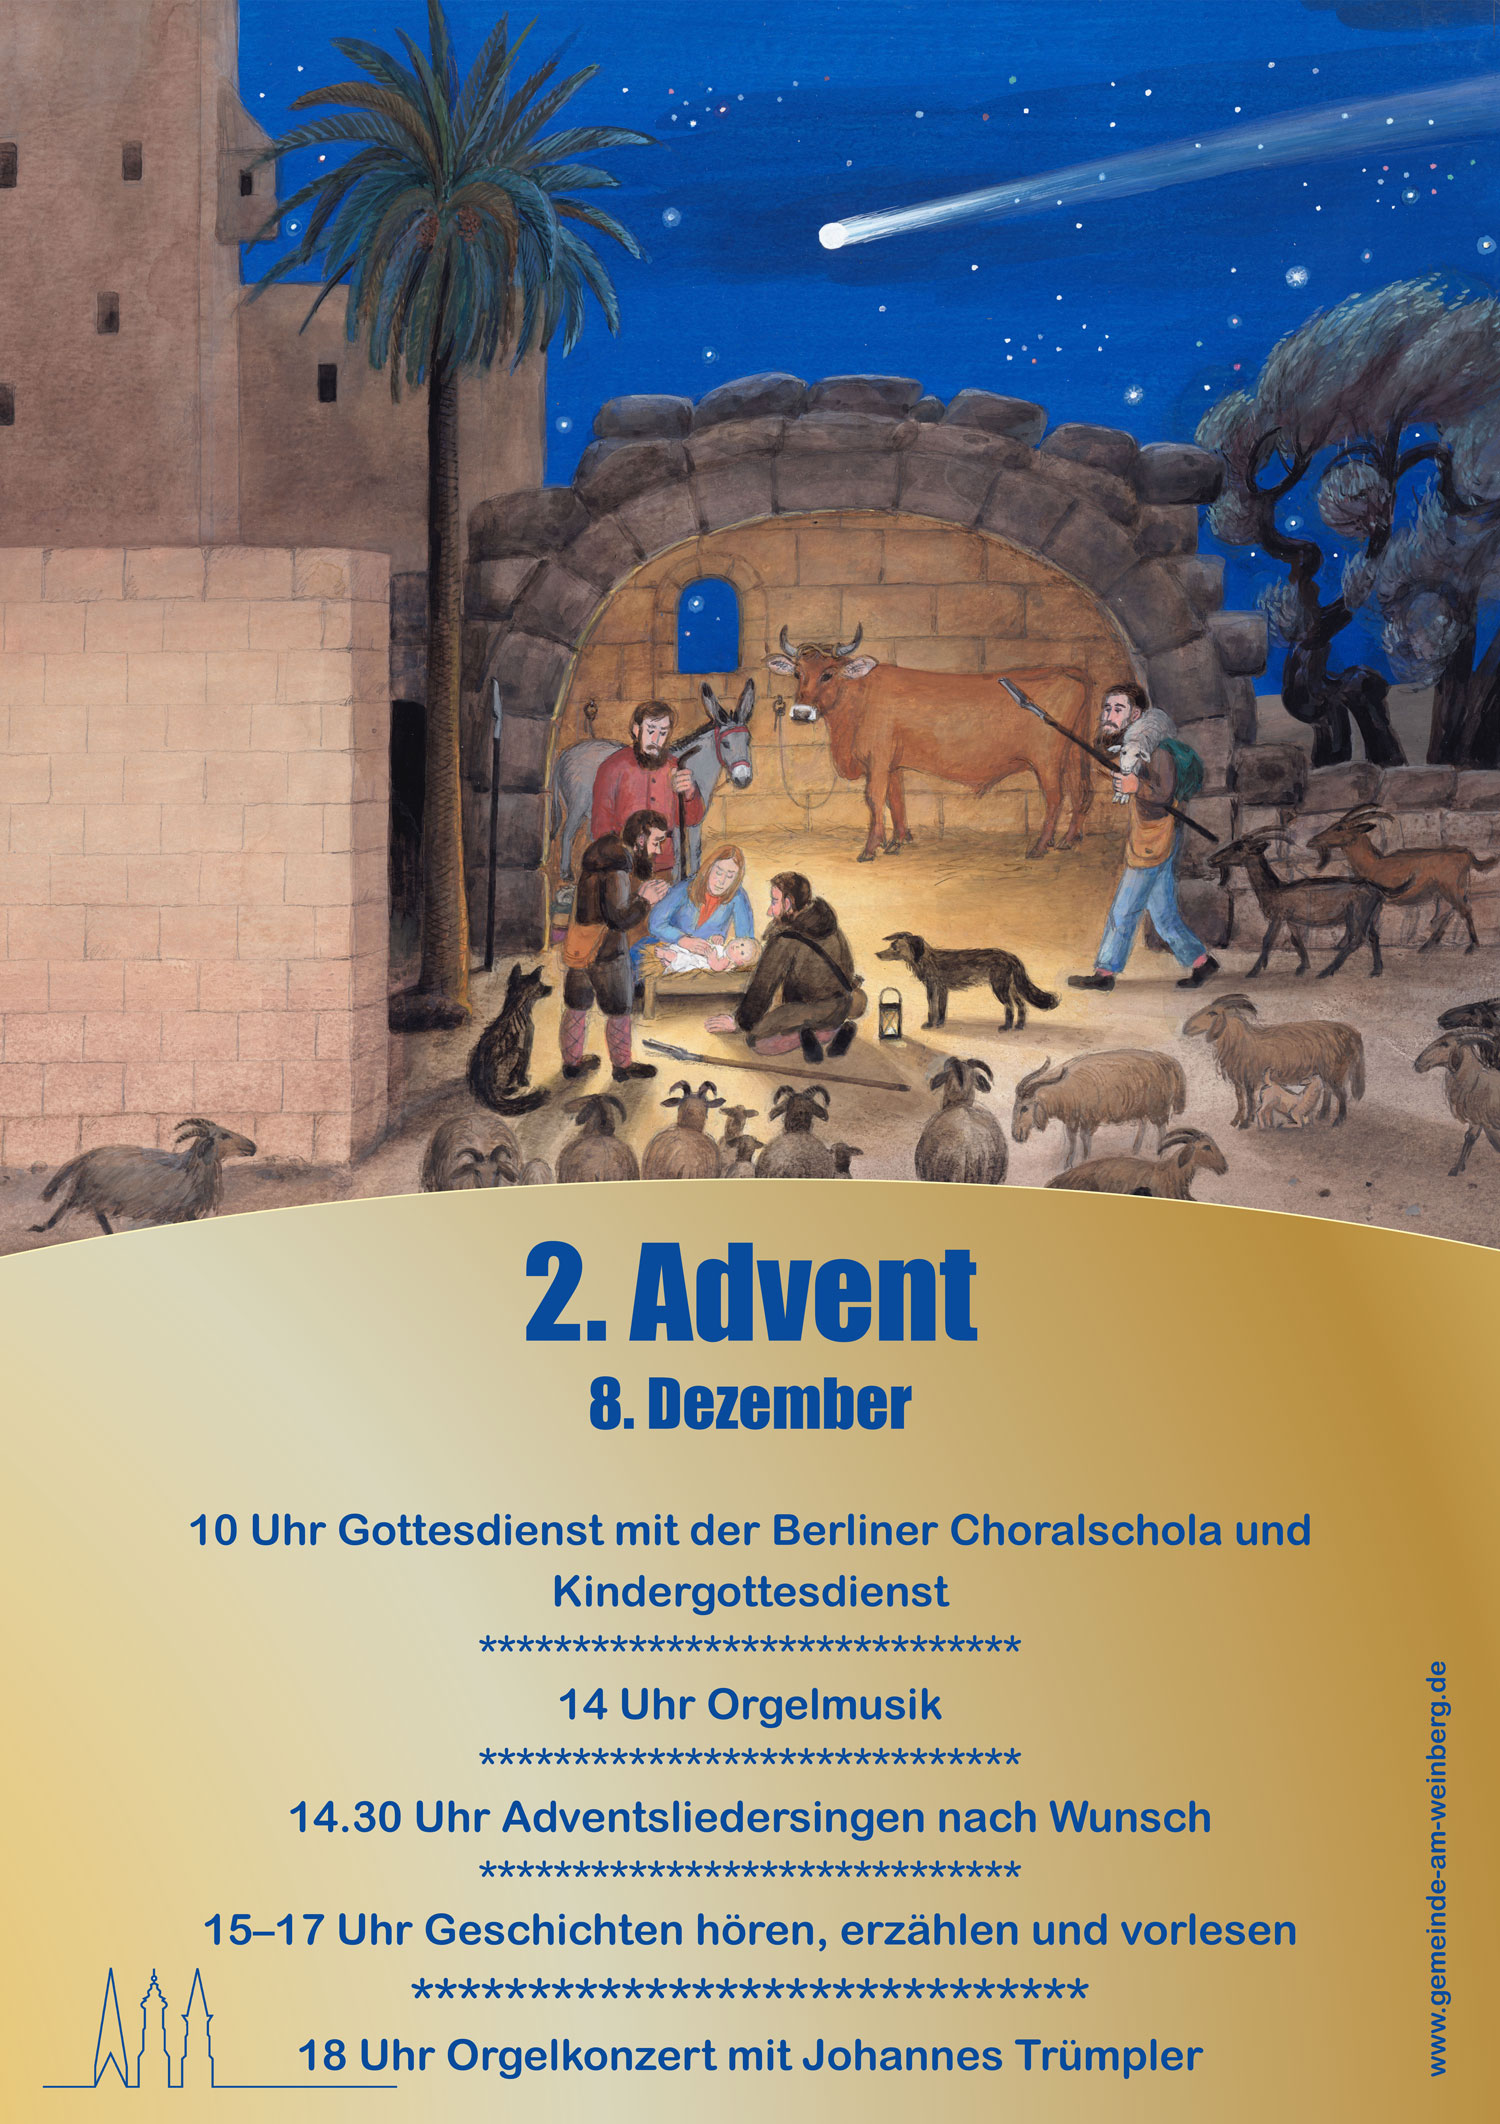 Plakat zum 2. Advent